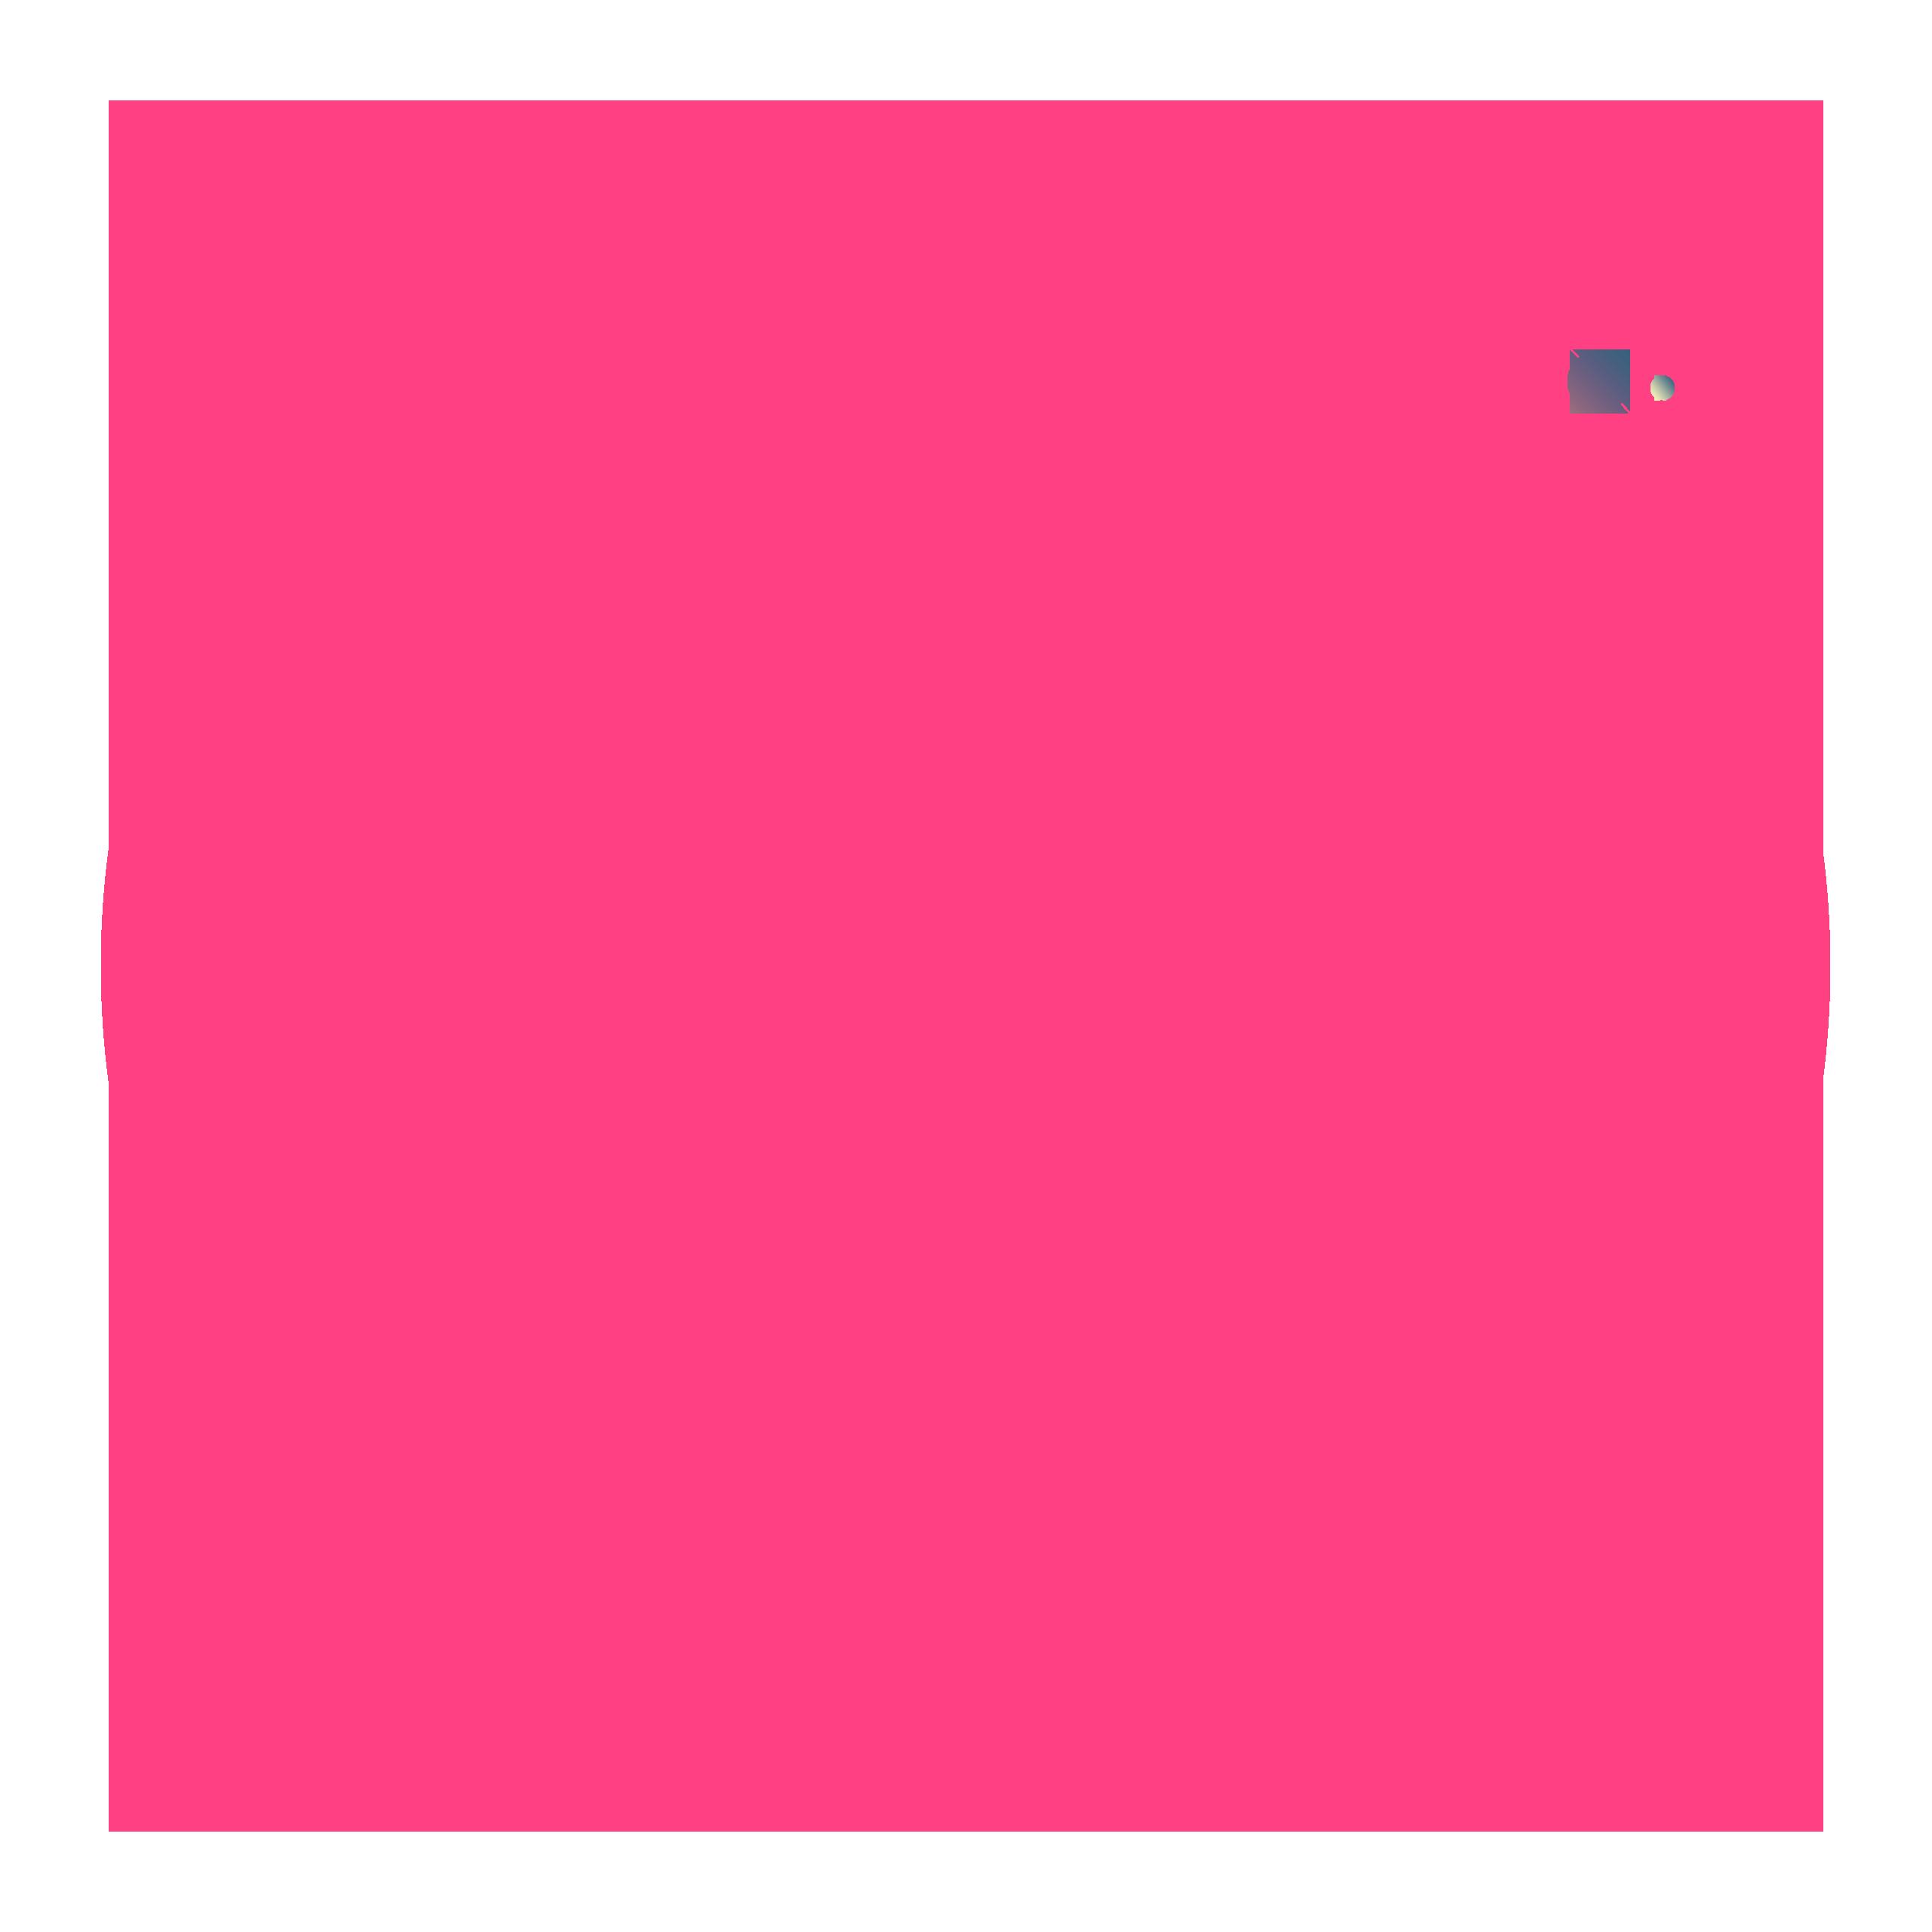 meng-he-brewgorithm-ani-8